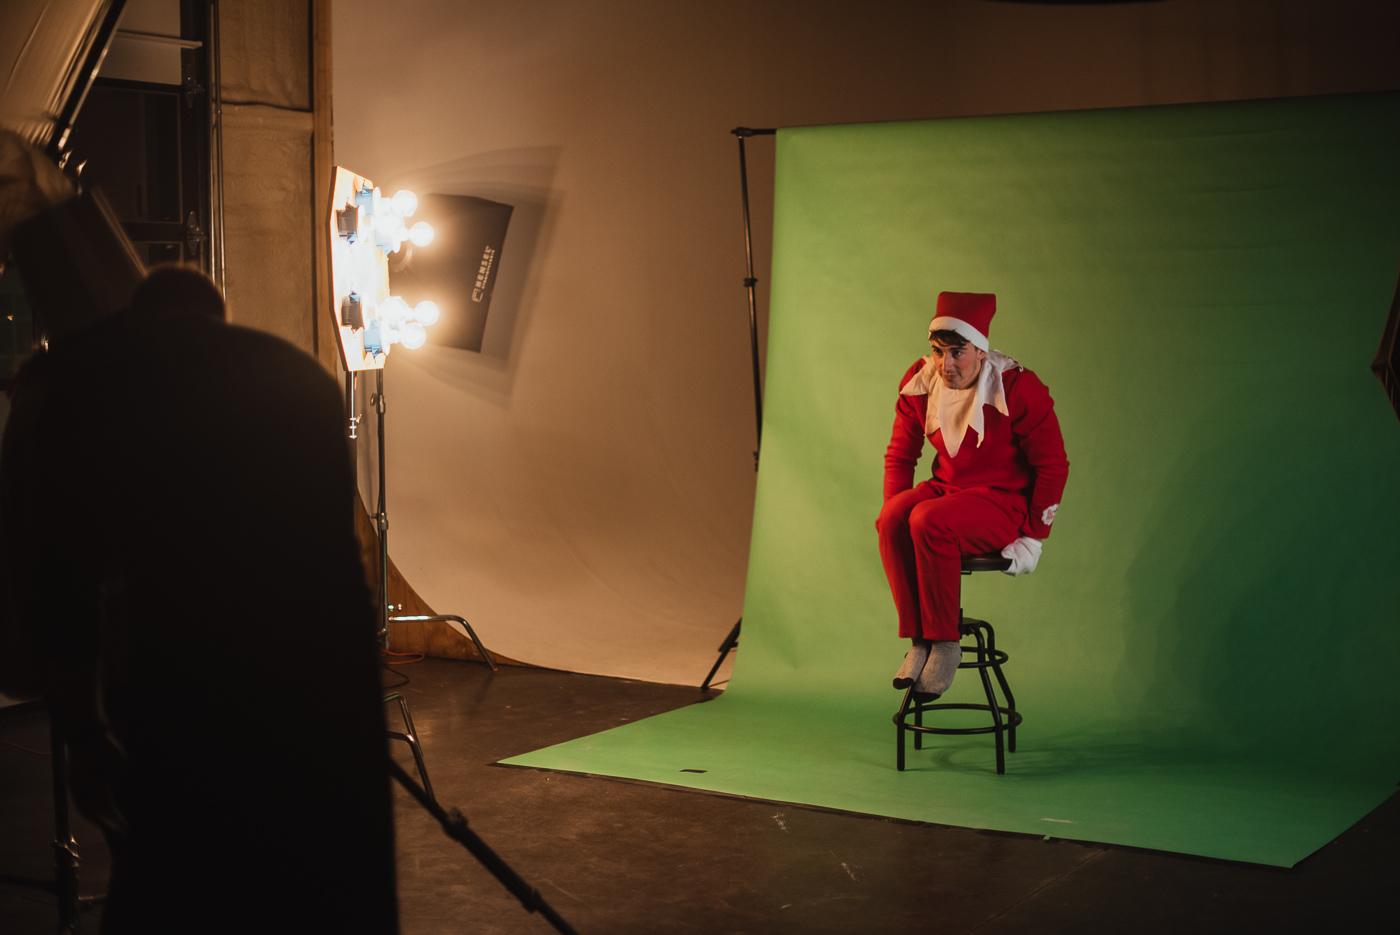 PHOCO Christmas Card The Articulate Photo Studio Green Screen Colorado Fort Collins Photographer Elf on the Shelf BTS-2.jpg